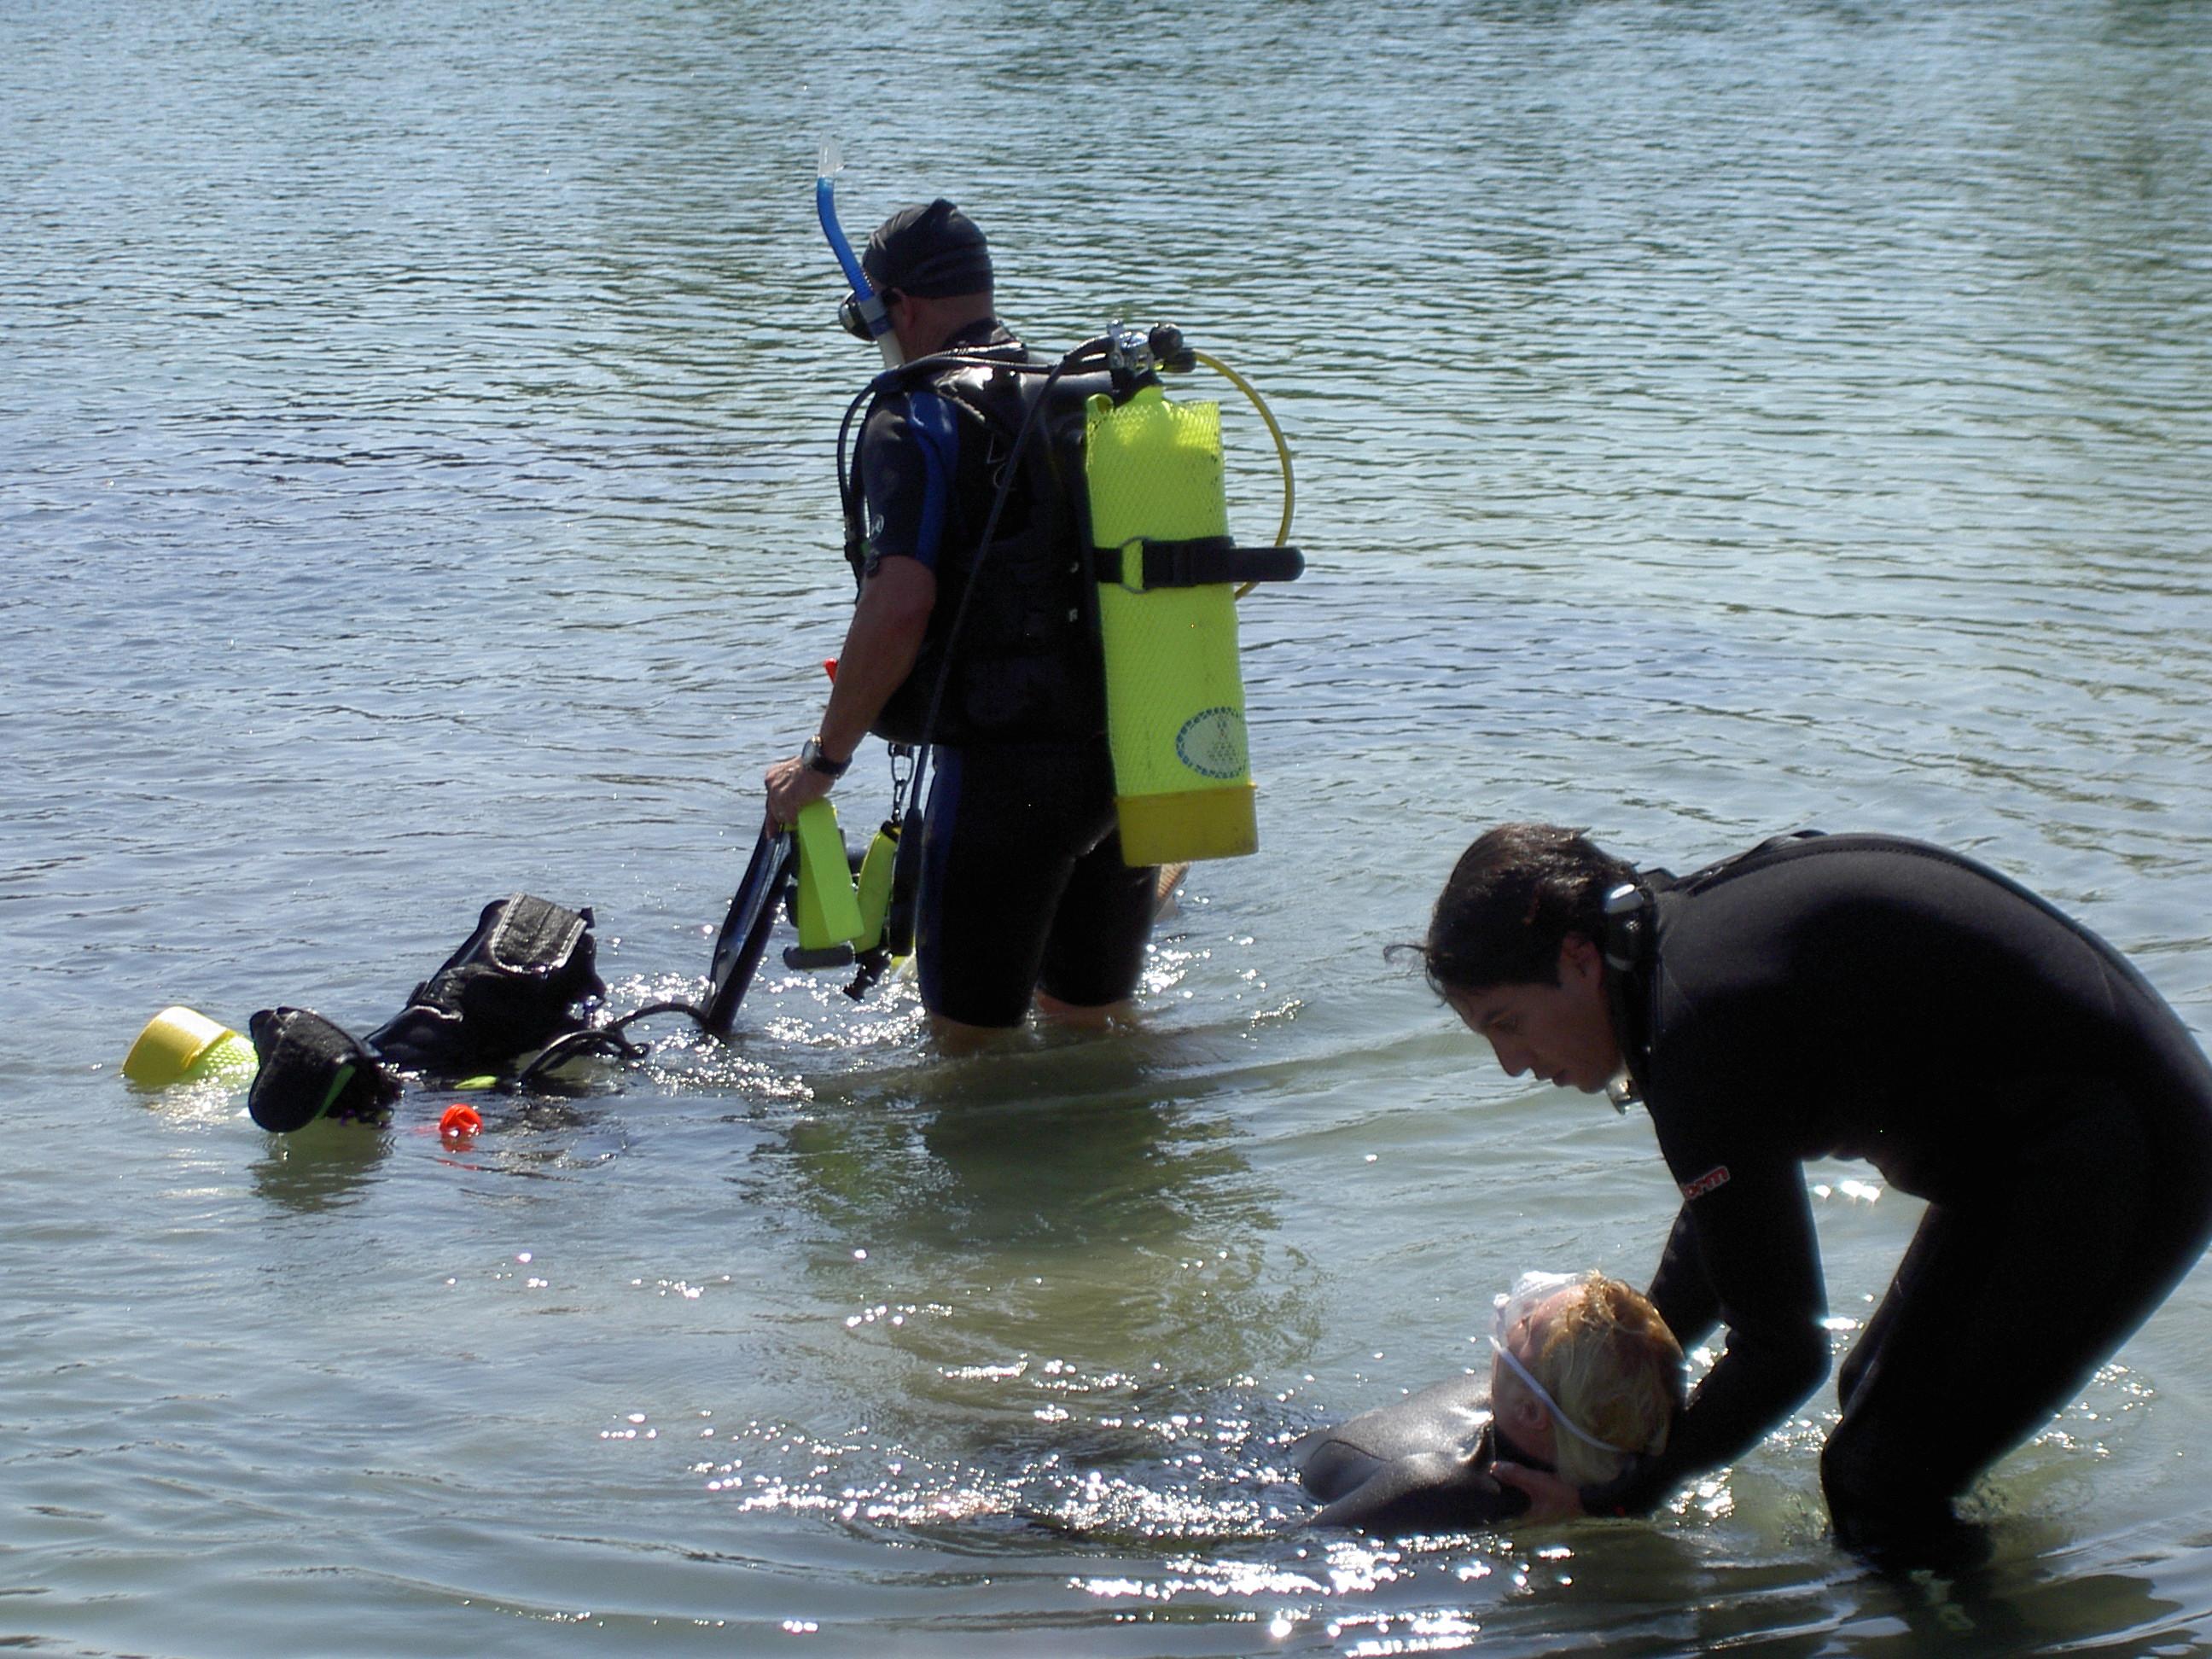 Alonissos, Alonnisos, Alonissos Triton Dive, Discover Scuba Diving